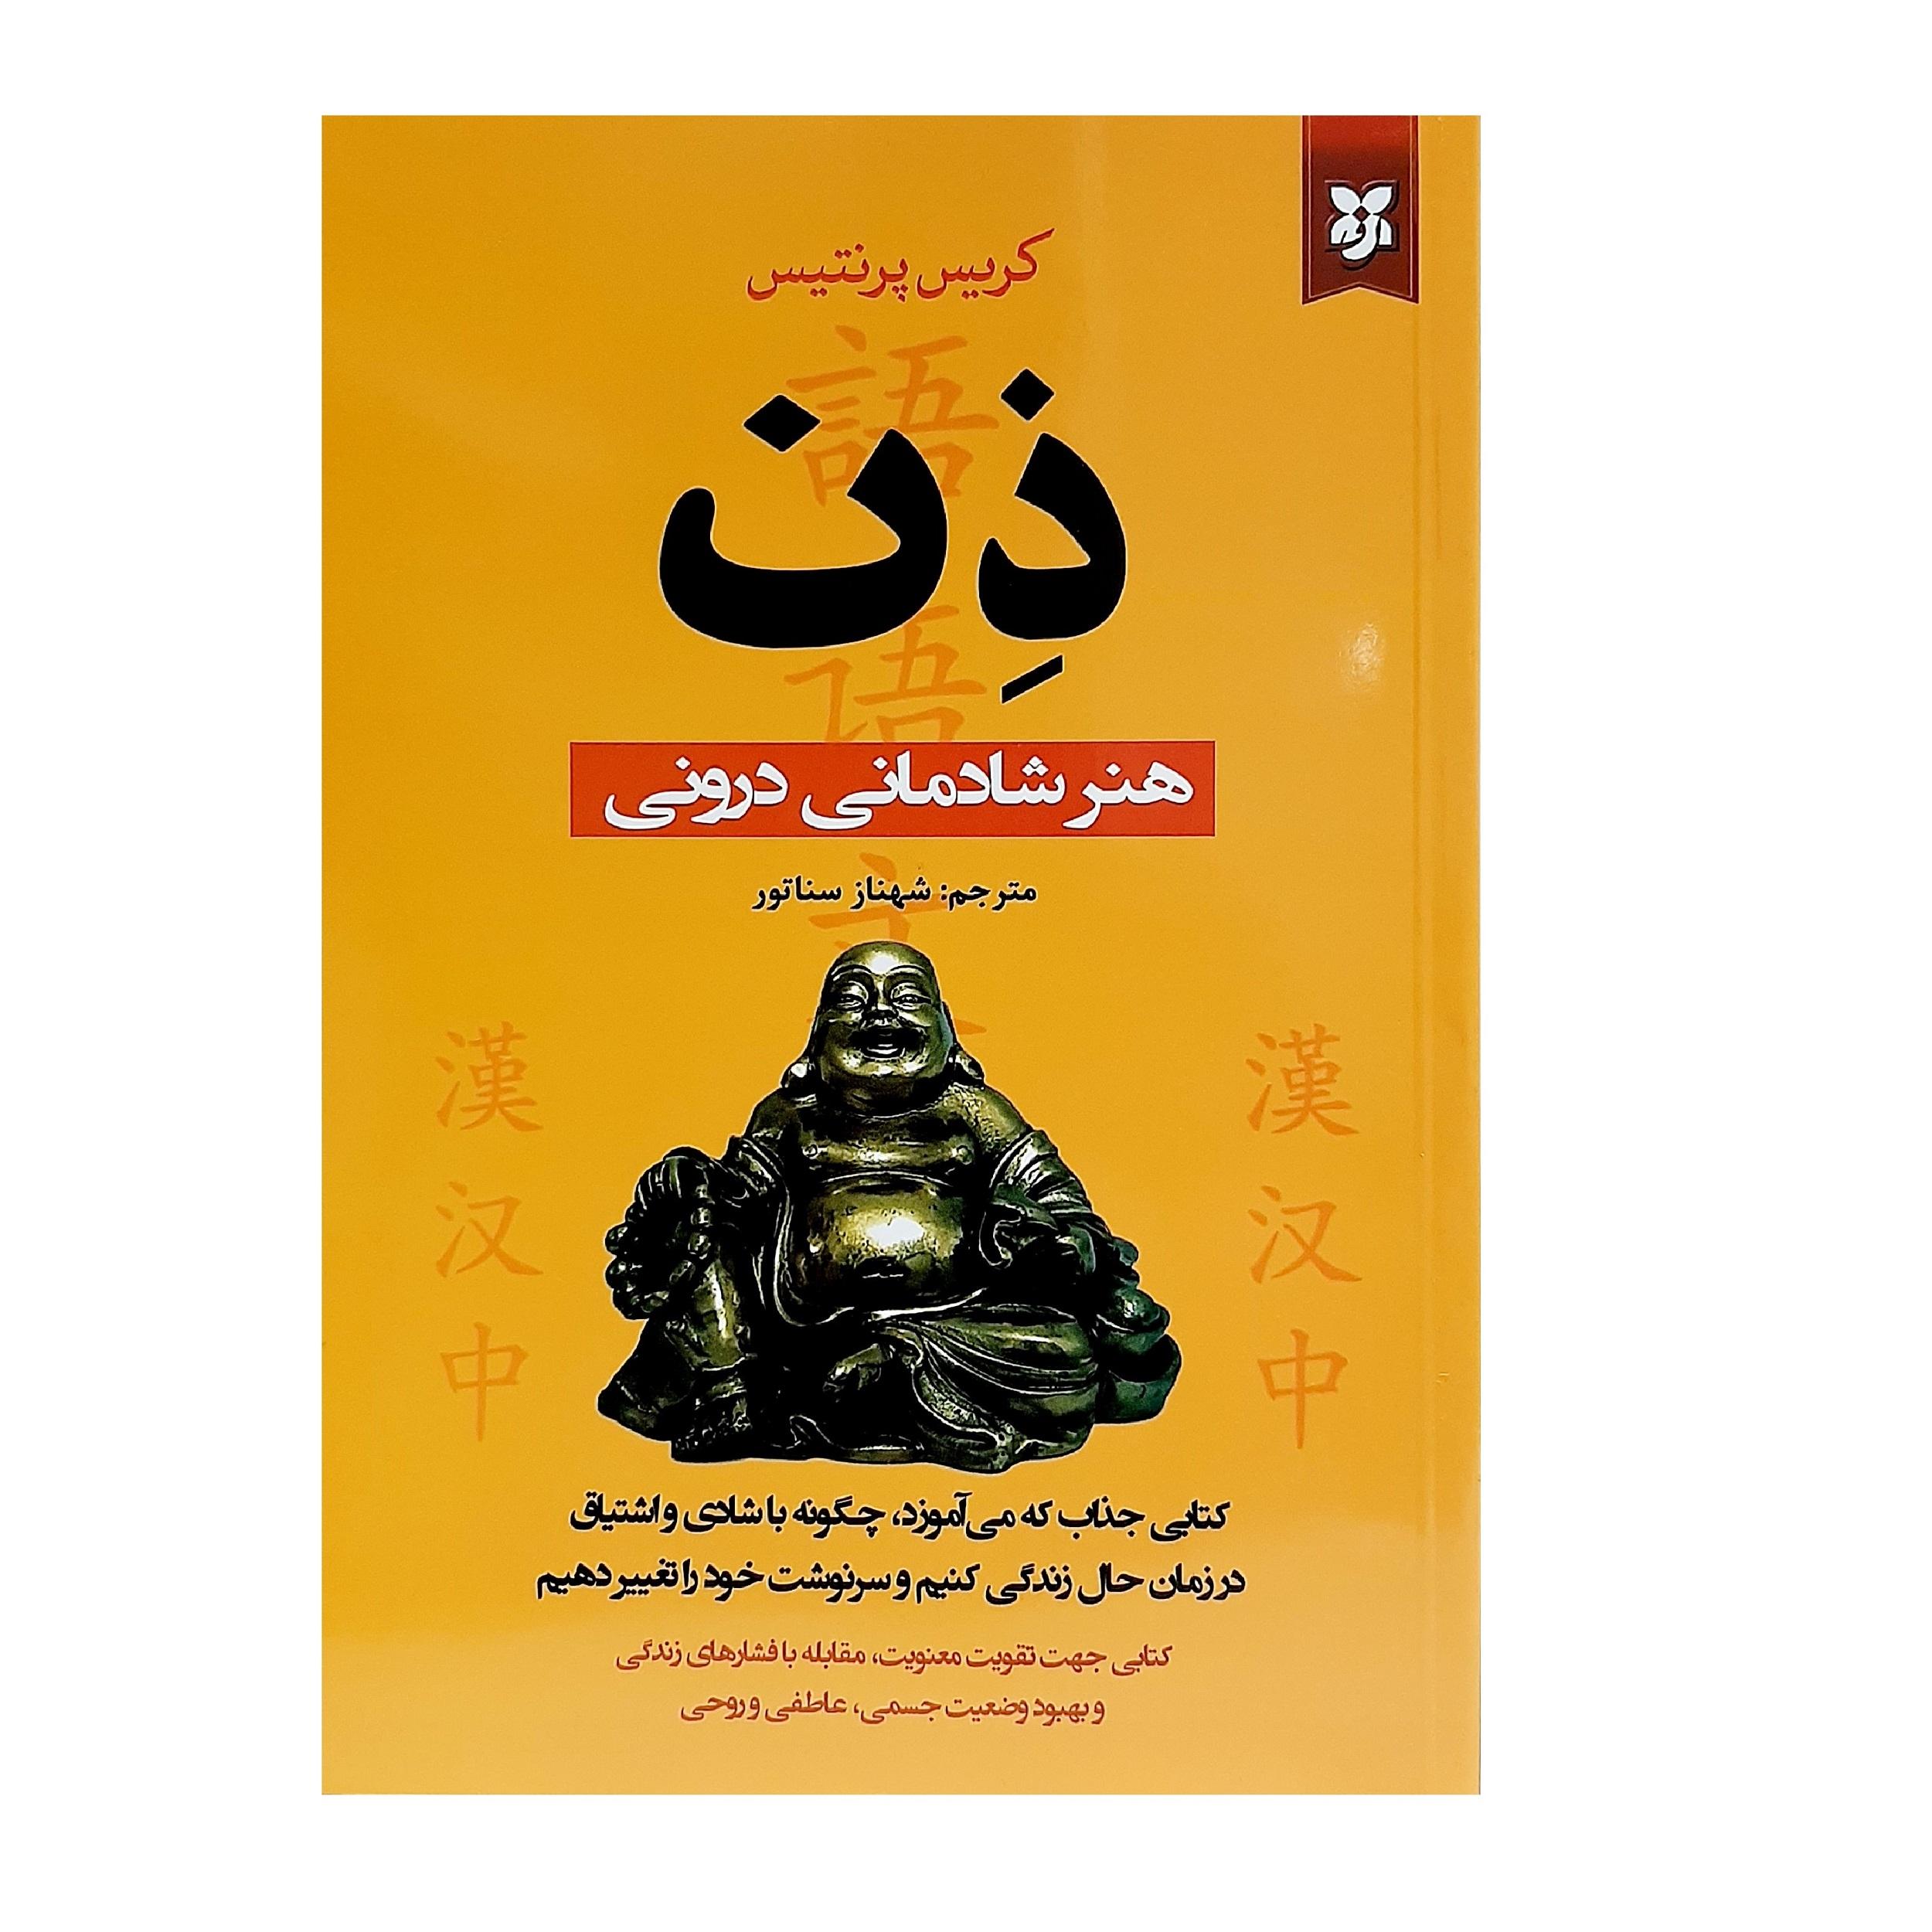 کتاب ذن هنر شادمانی درونی اثر کریس پرنتیس انتشارات نیک فرجام